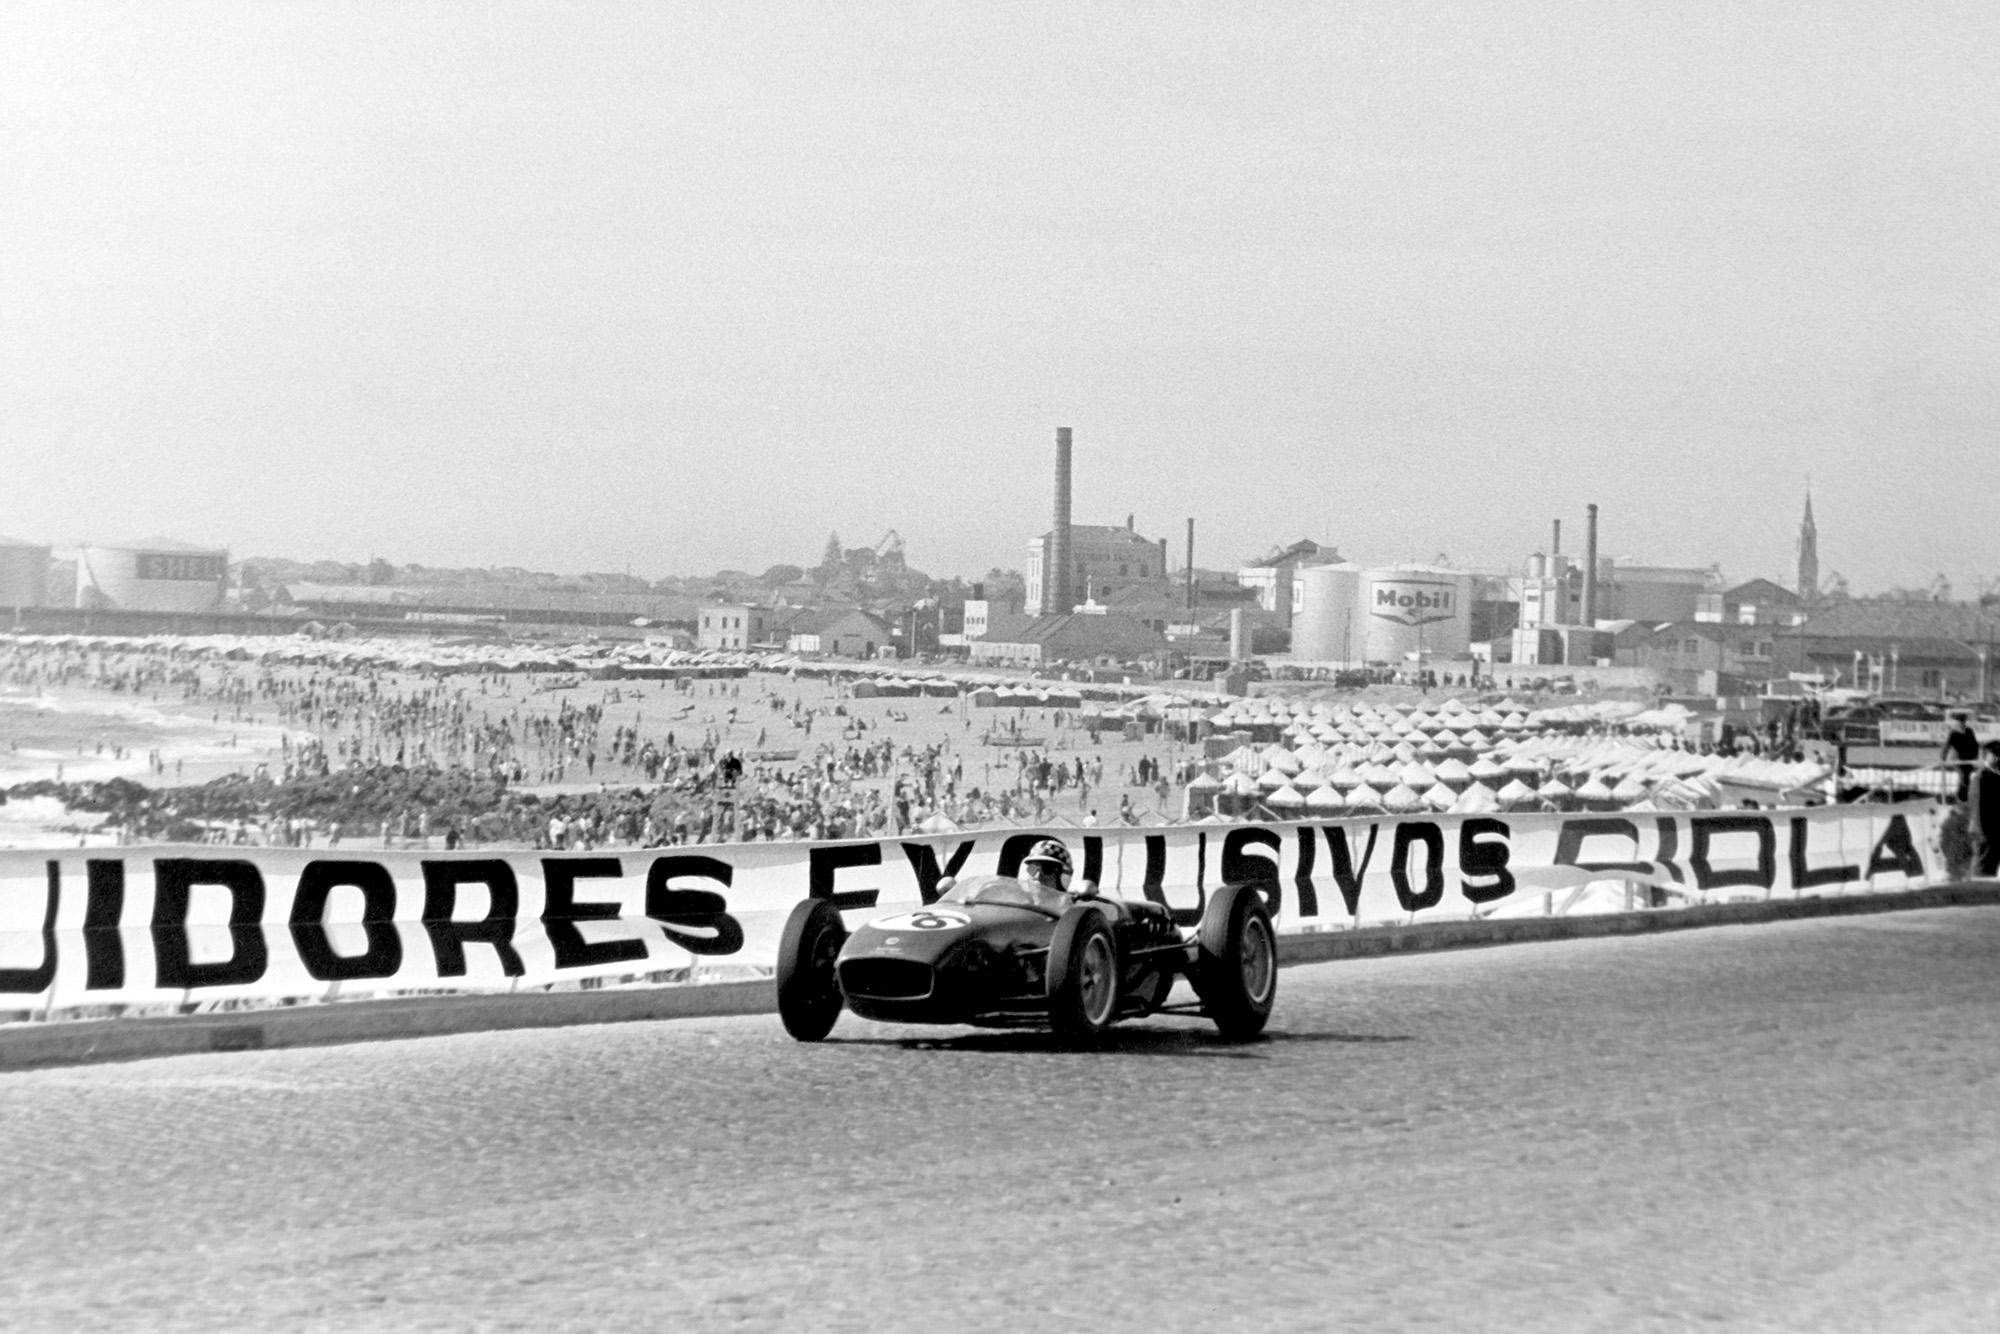 Ireland put his Lotus 6th on the grid